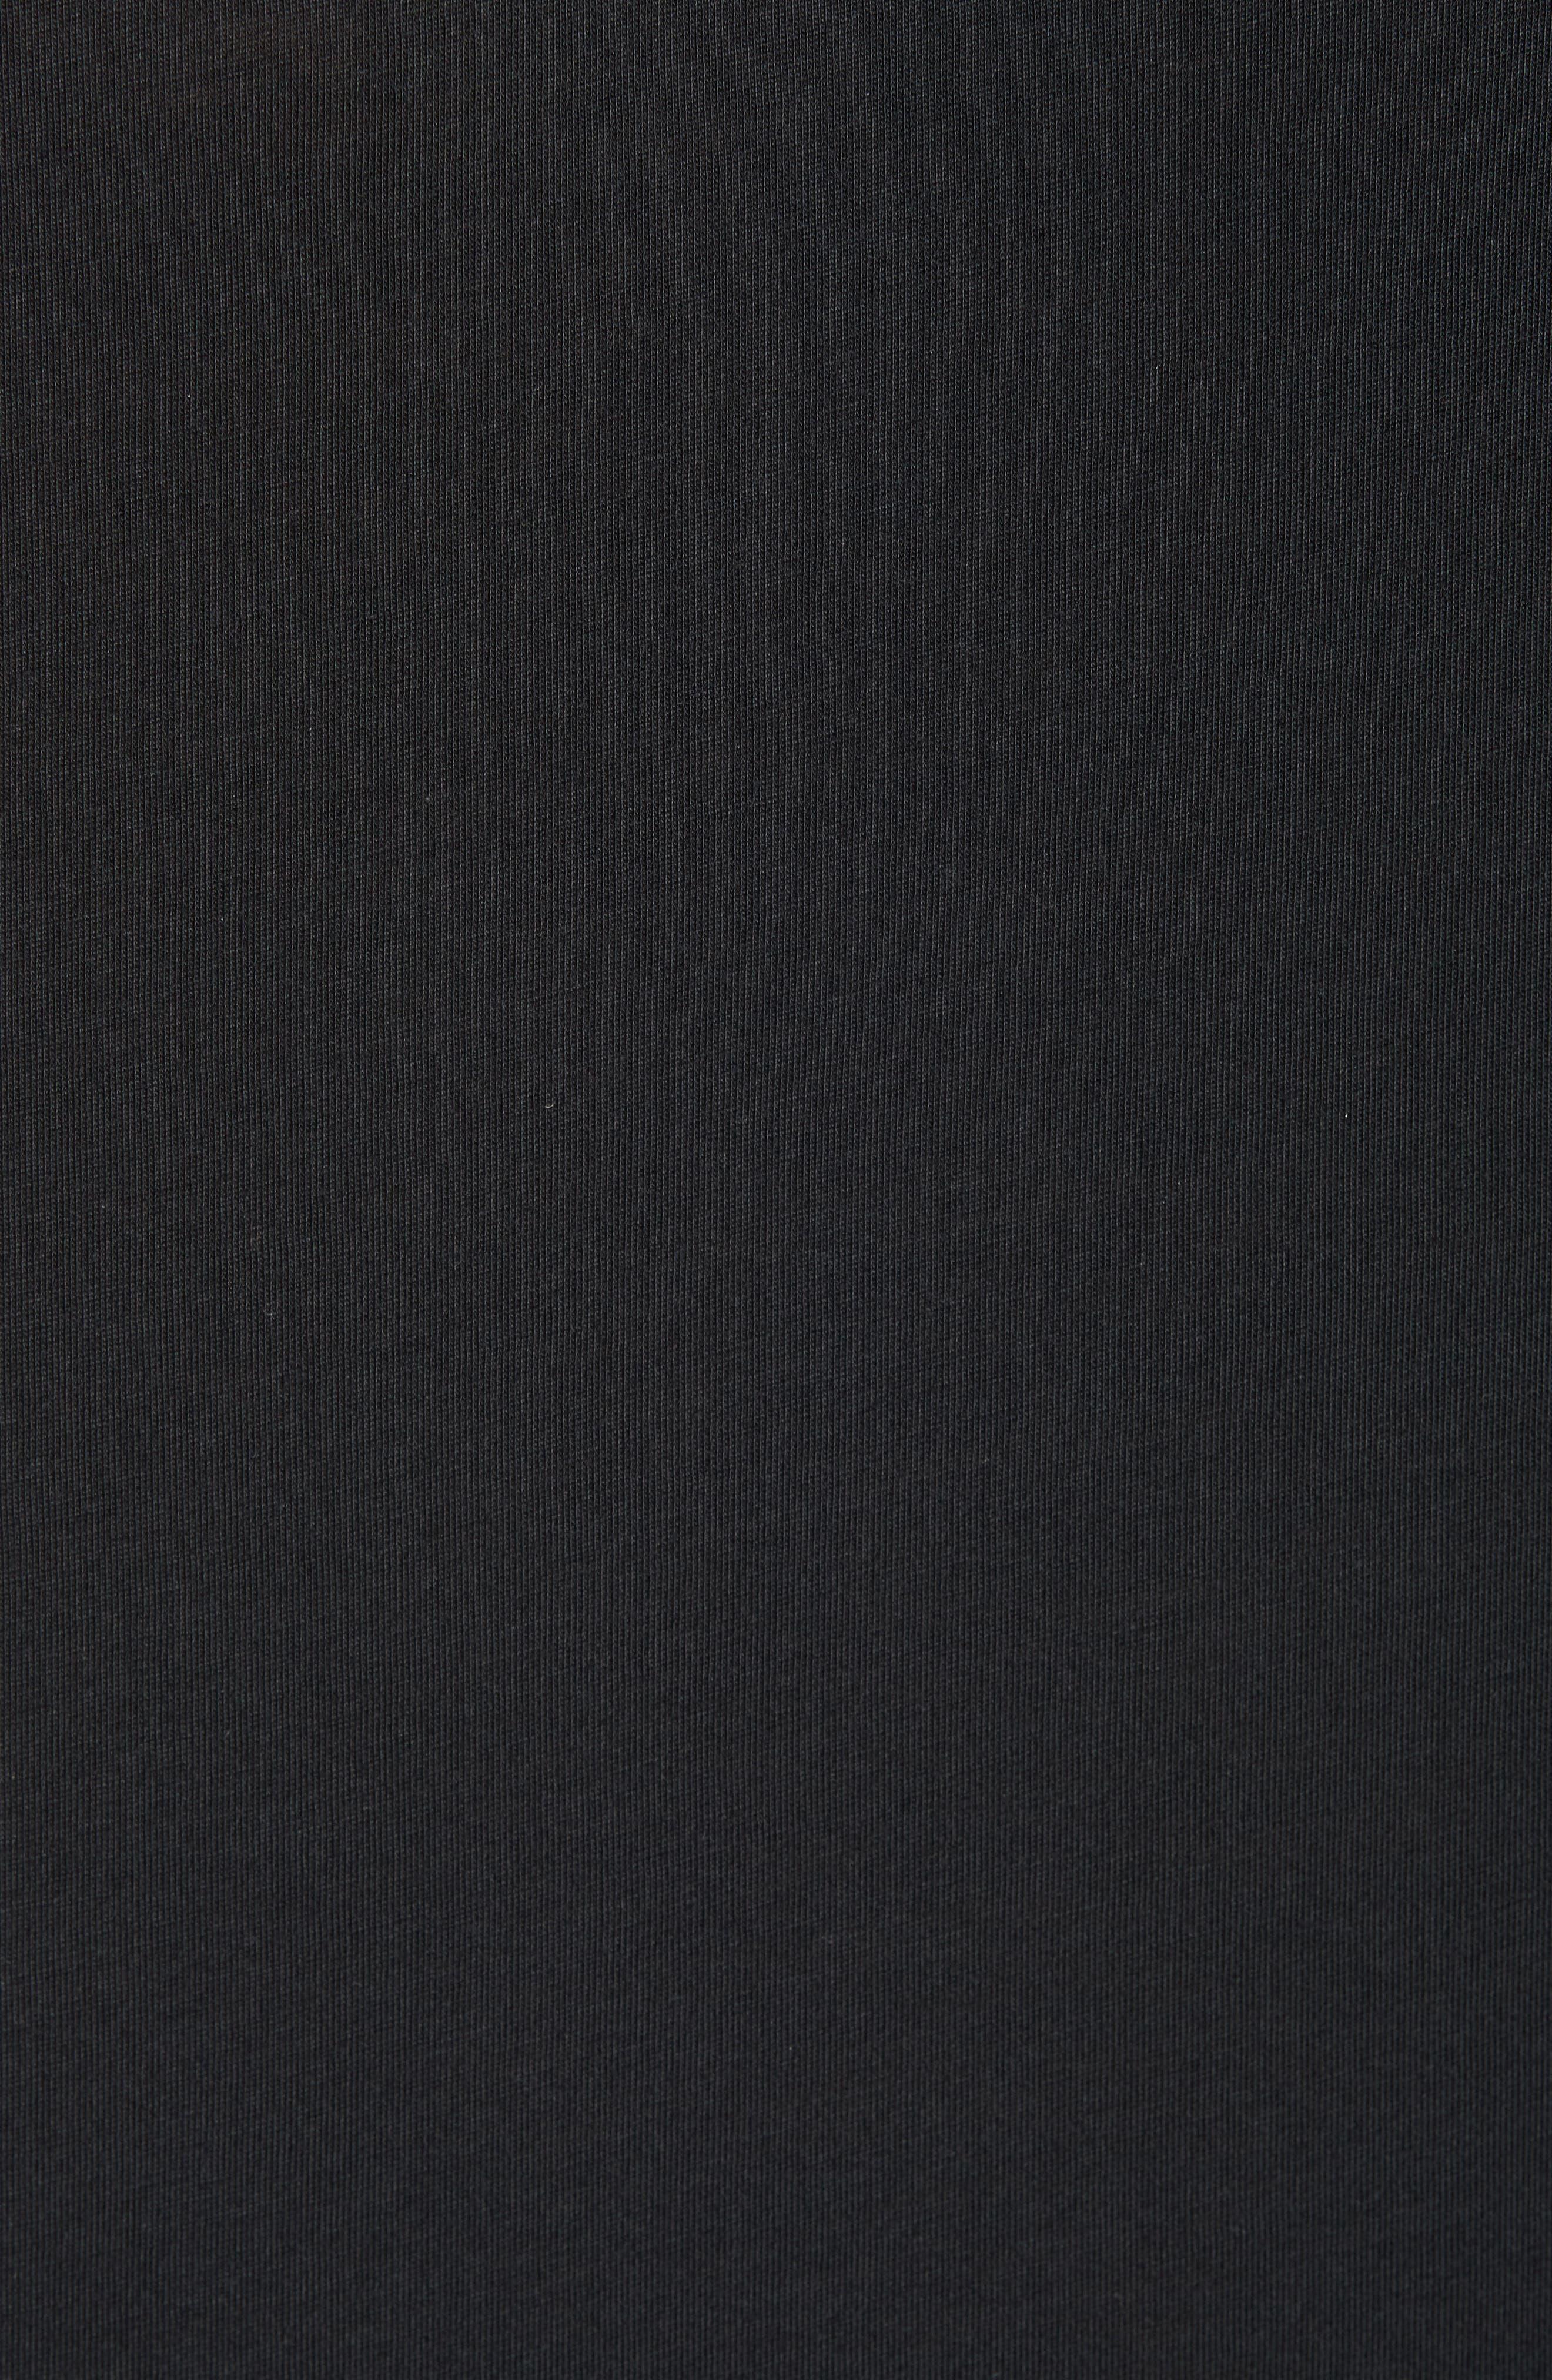 23 Alpha Dry Sleeveless Hoodie,                             Alternate thumbnail 5, color,                             BLACK/ WHITE